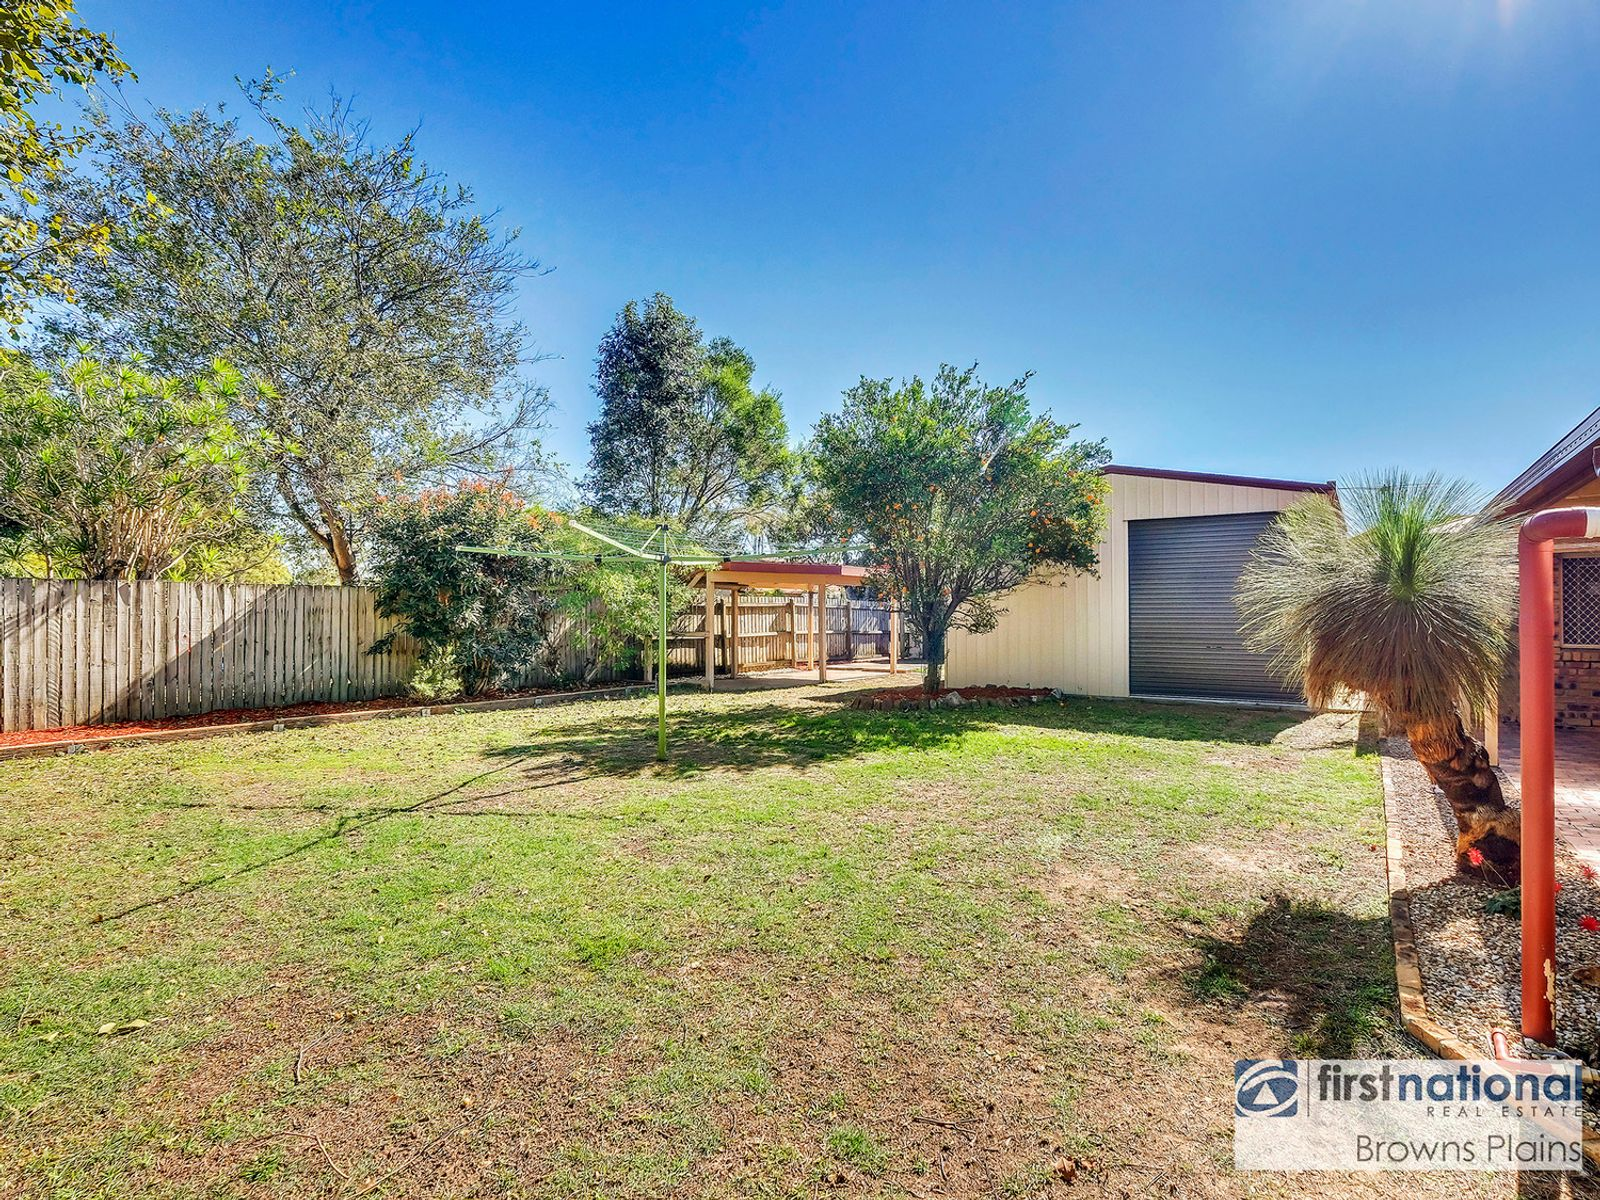 49 Peverell Street, Hillcrest, QLD 4118